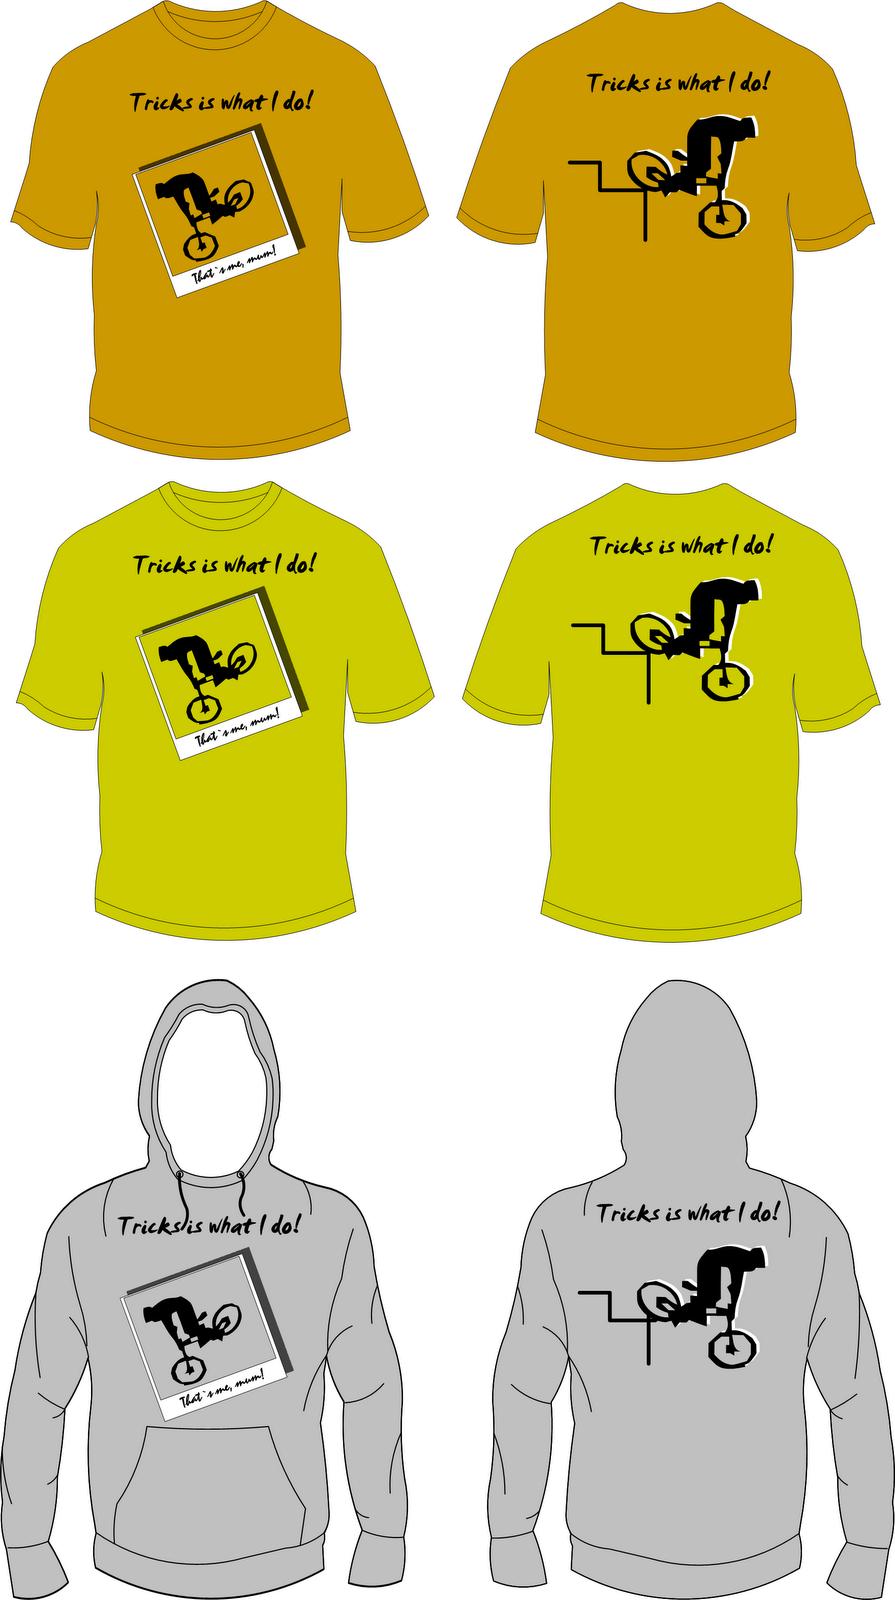 Shirt design blog - Shirt Design Blog 87